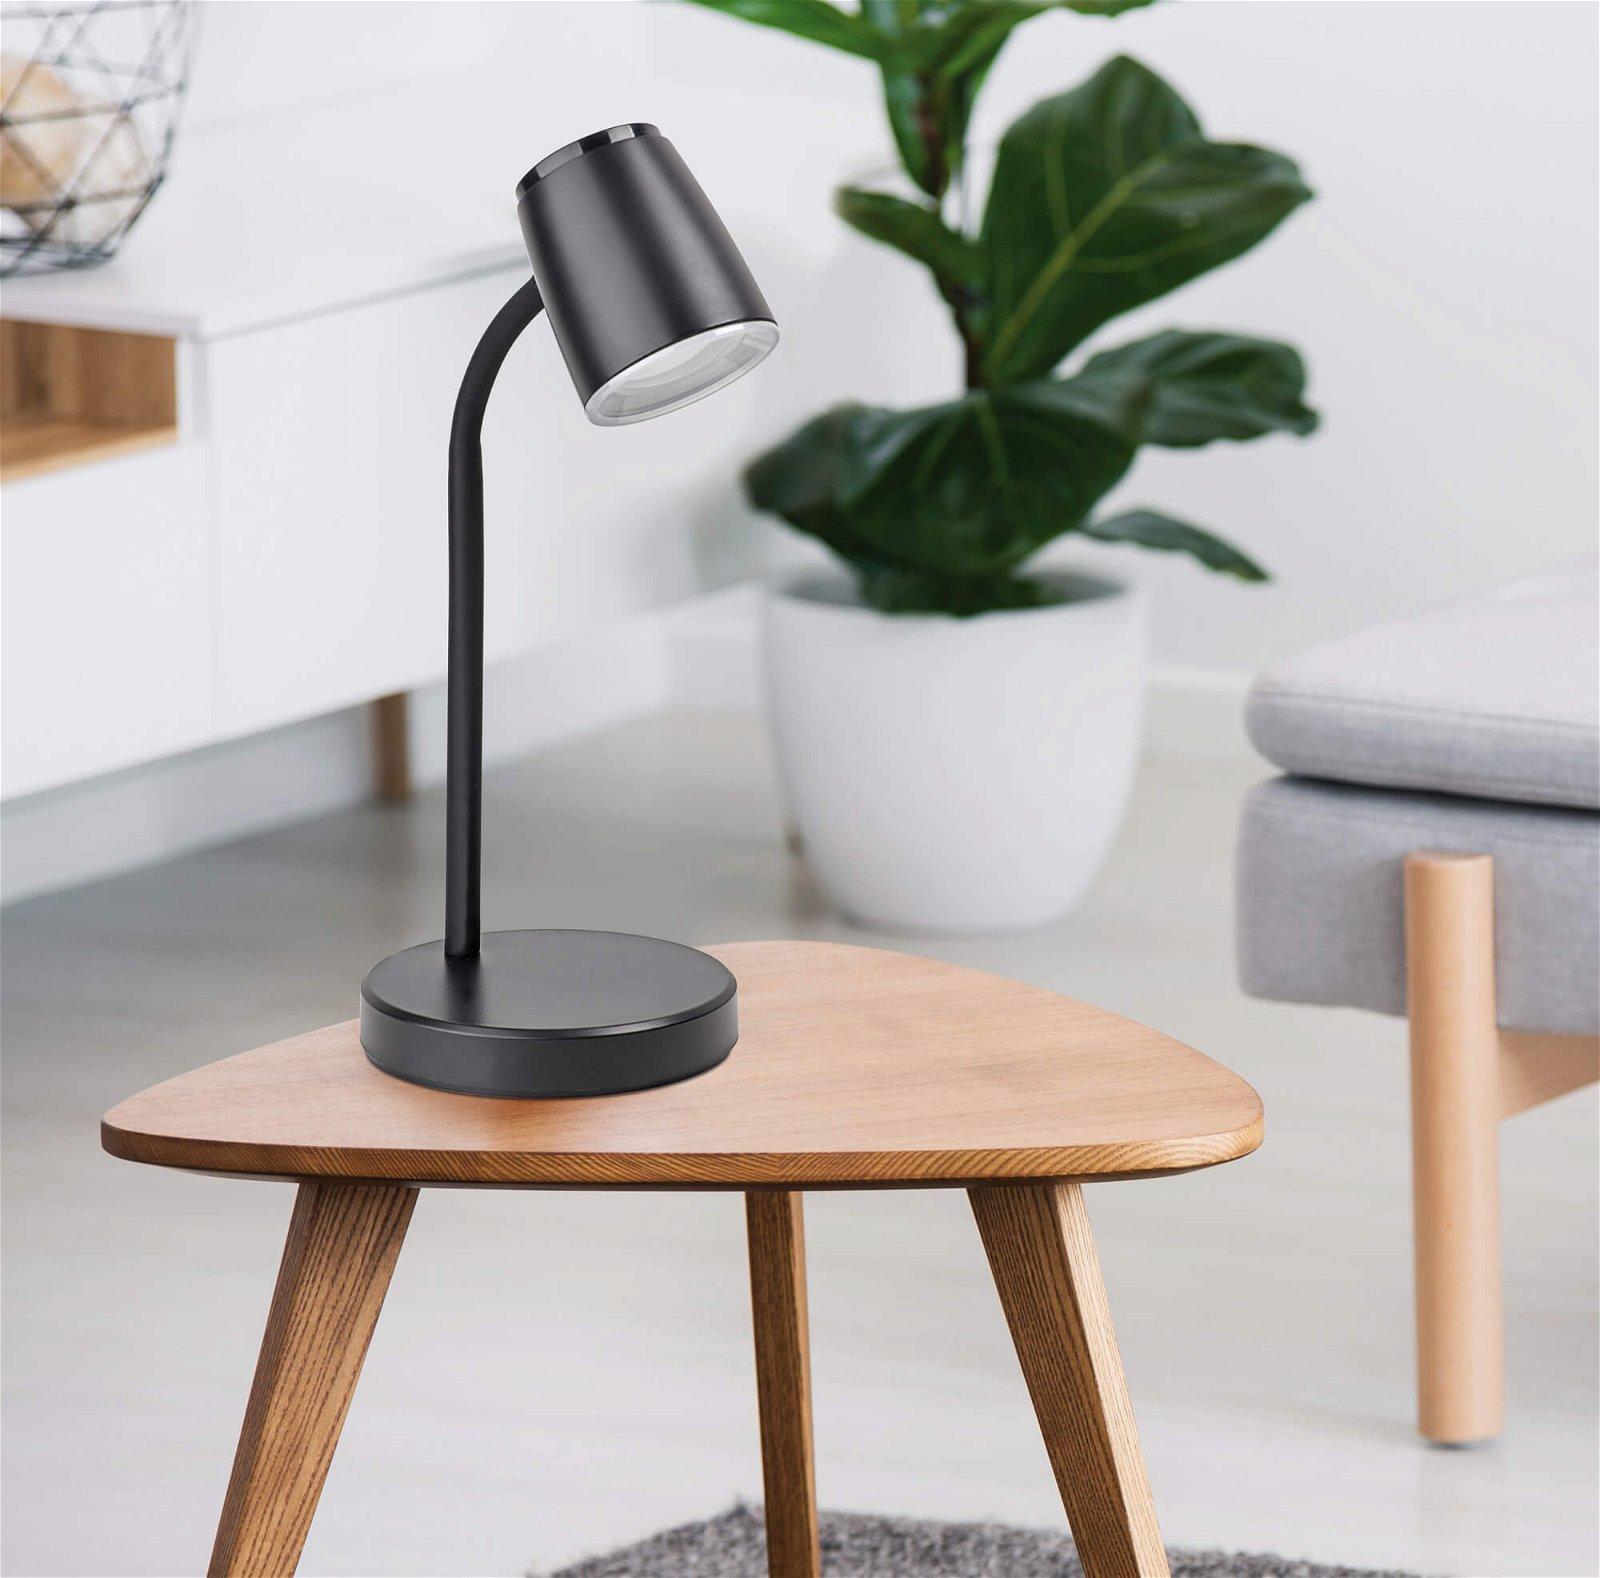 LED-Tischleuchte MAULabby